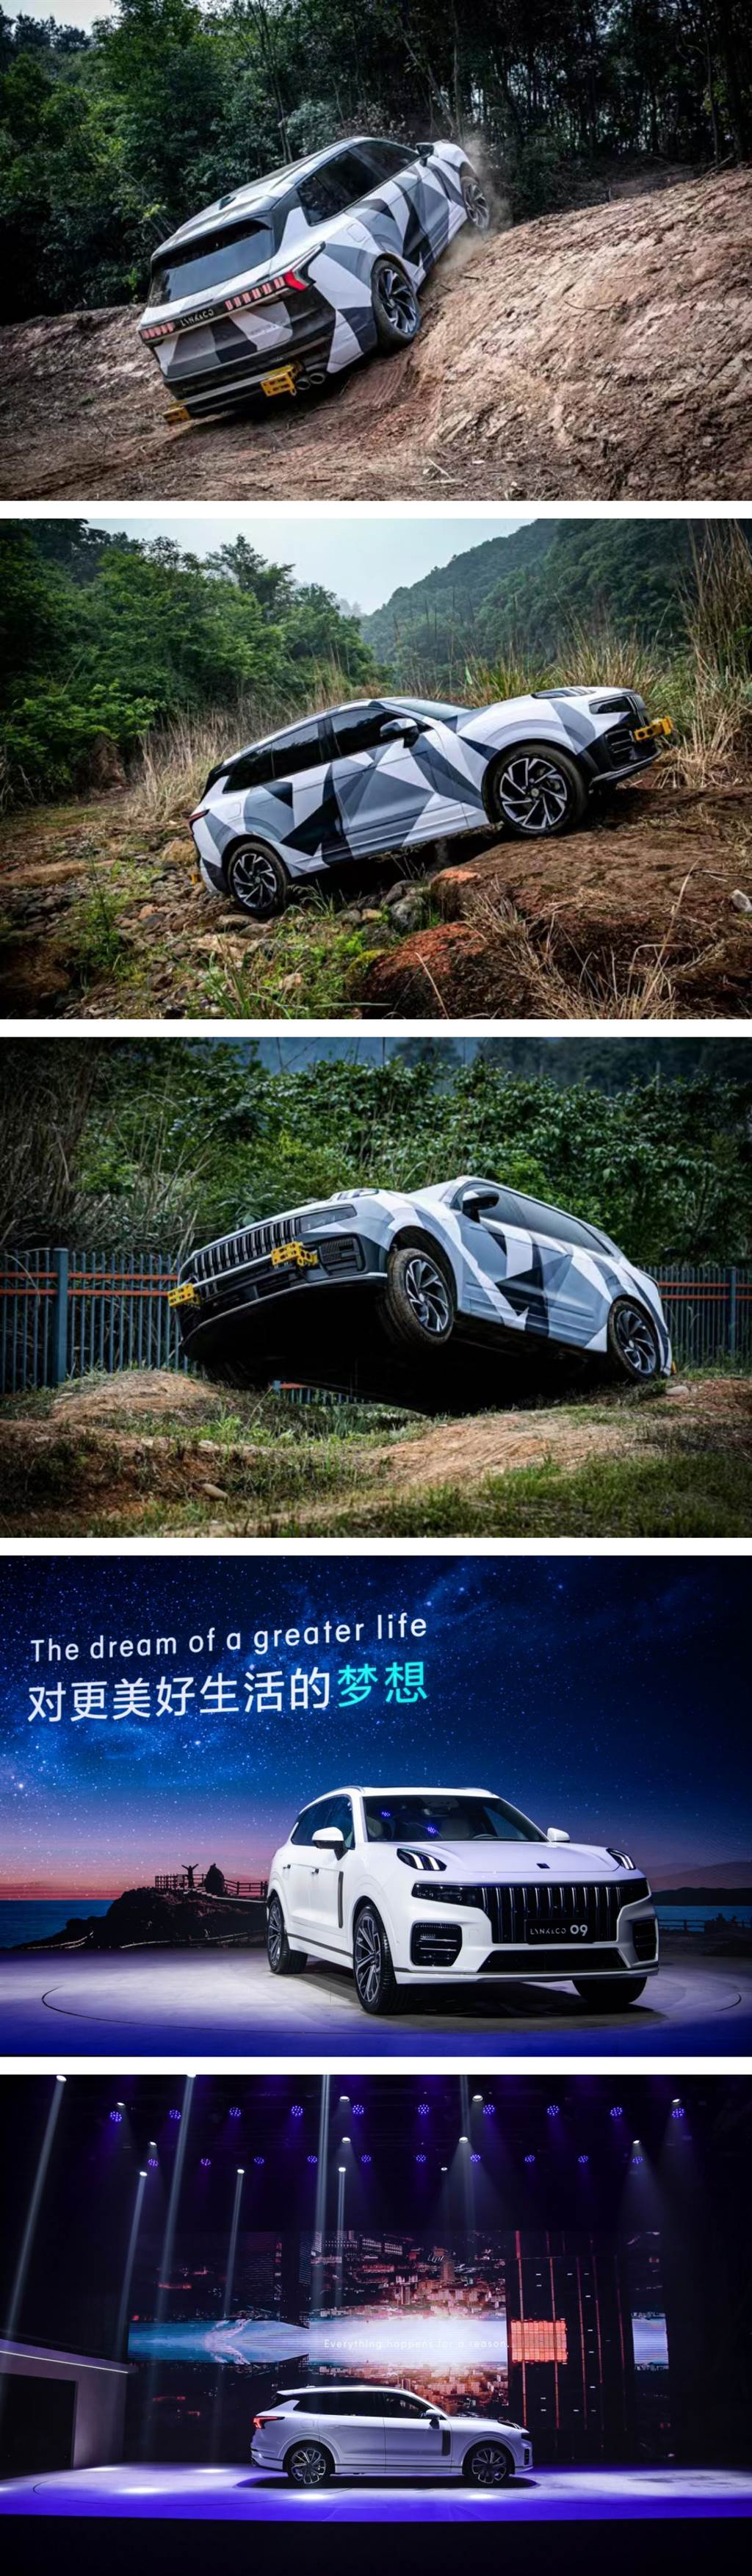 VOLVO XC90的異國兄弟 Lynk&Co 09旗艦SUV上海首發